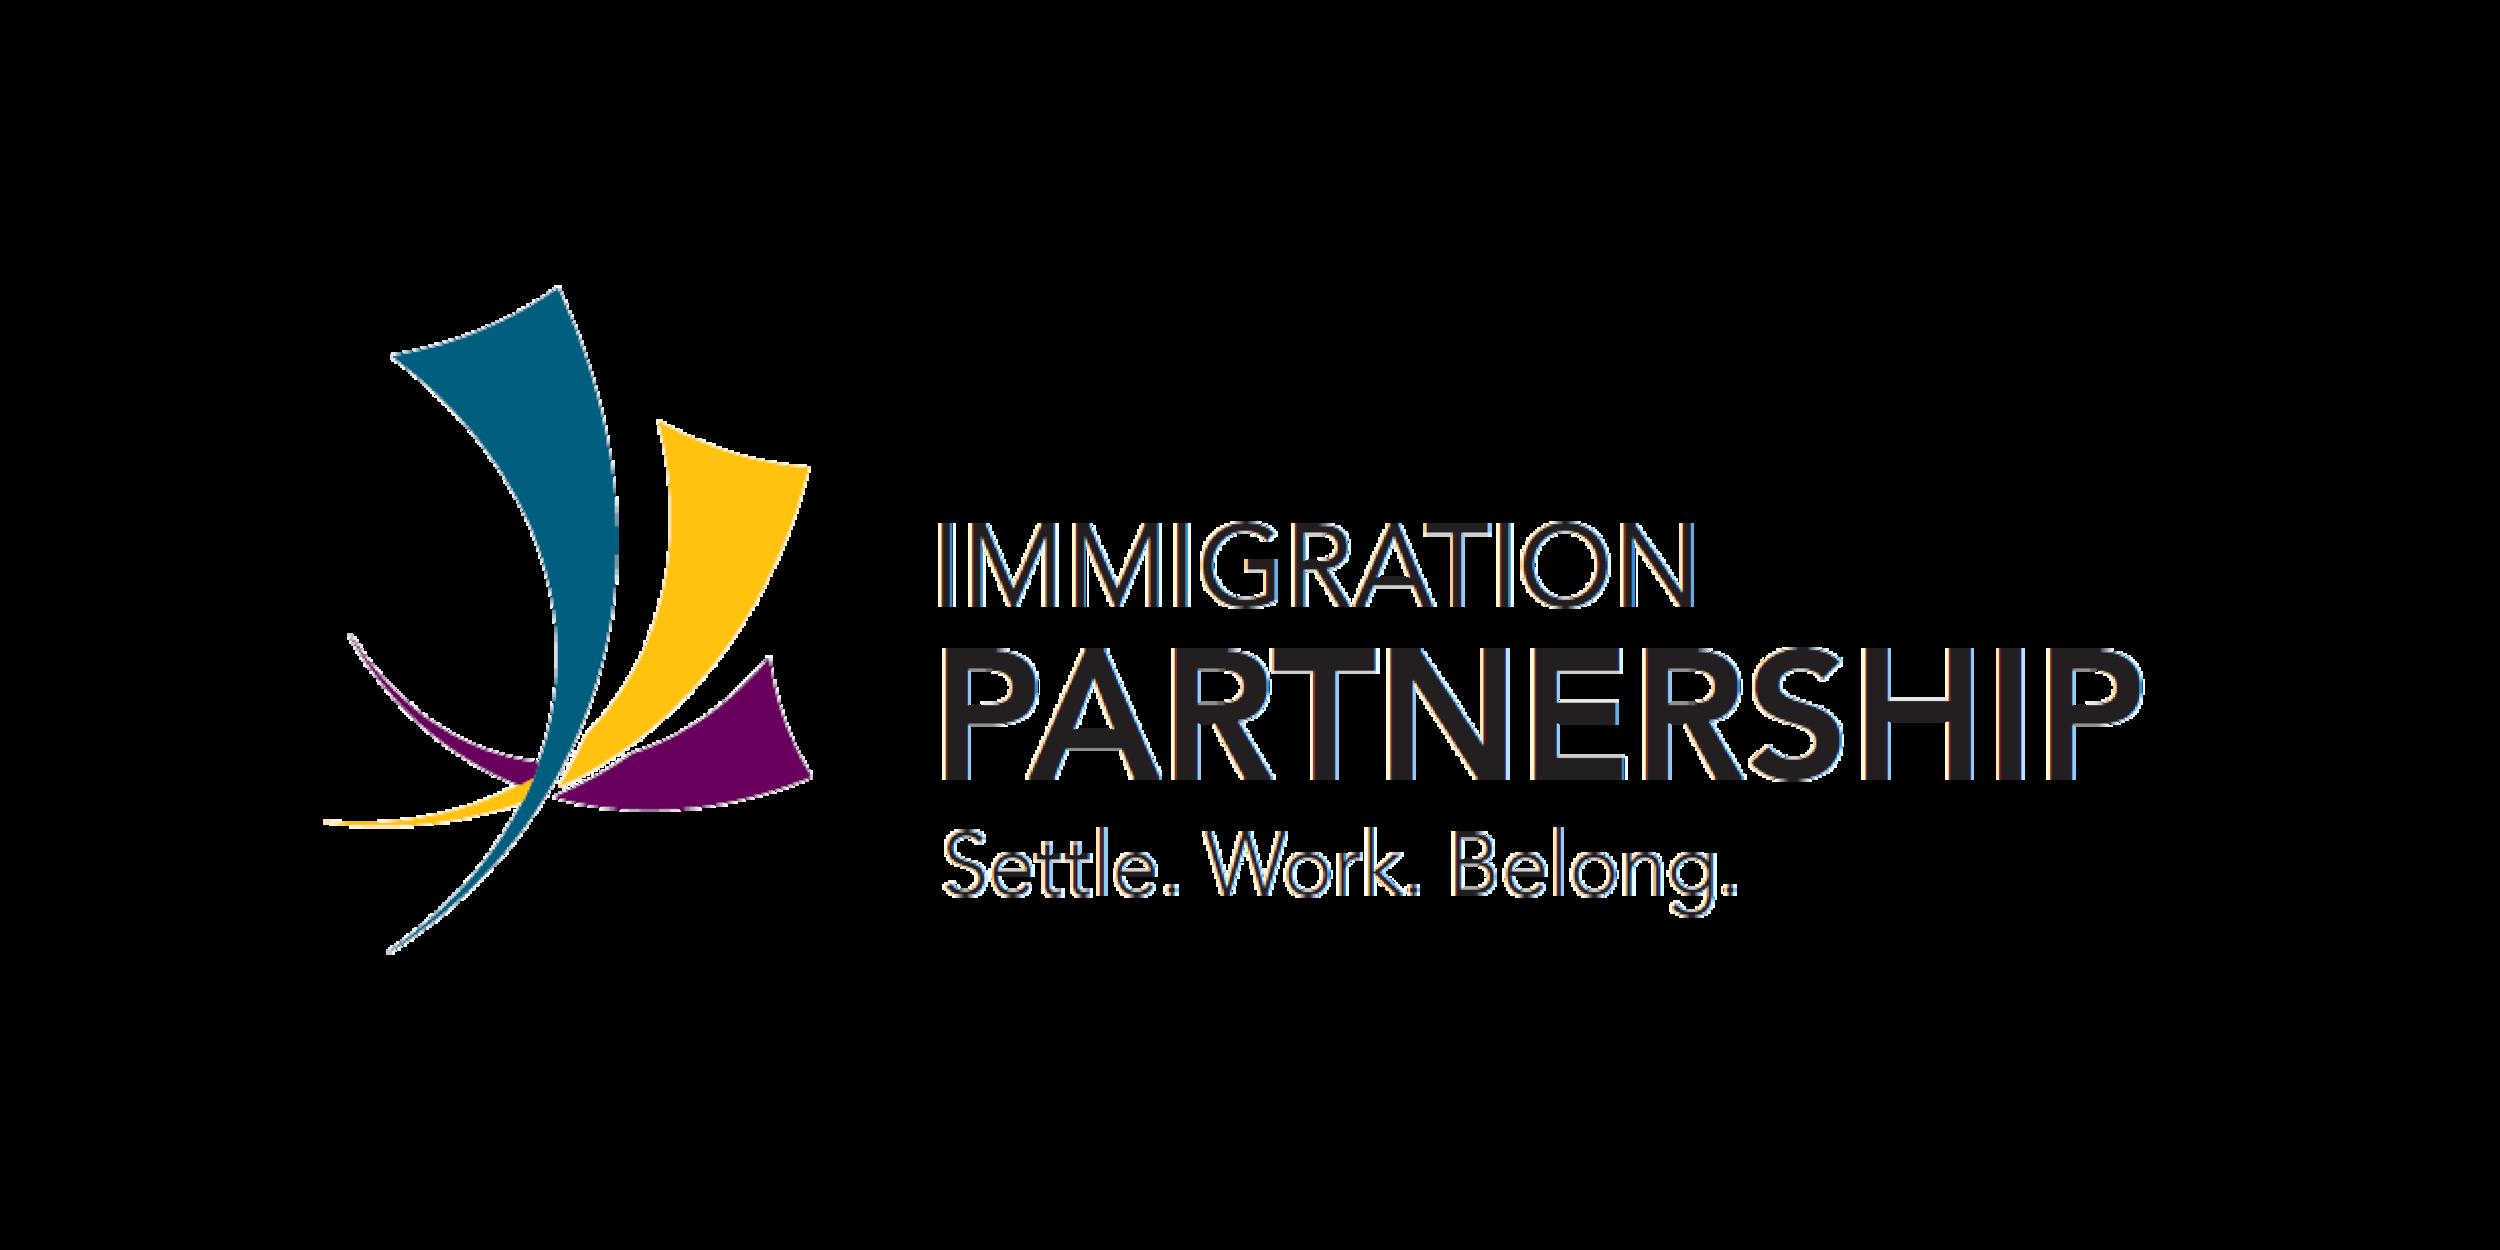 Immigration Partnership-logo-01.png